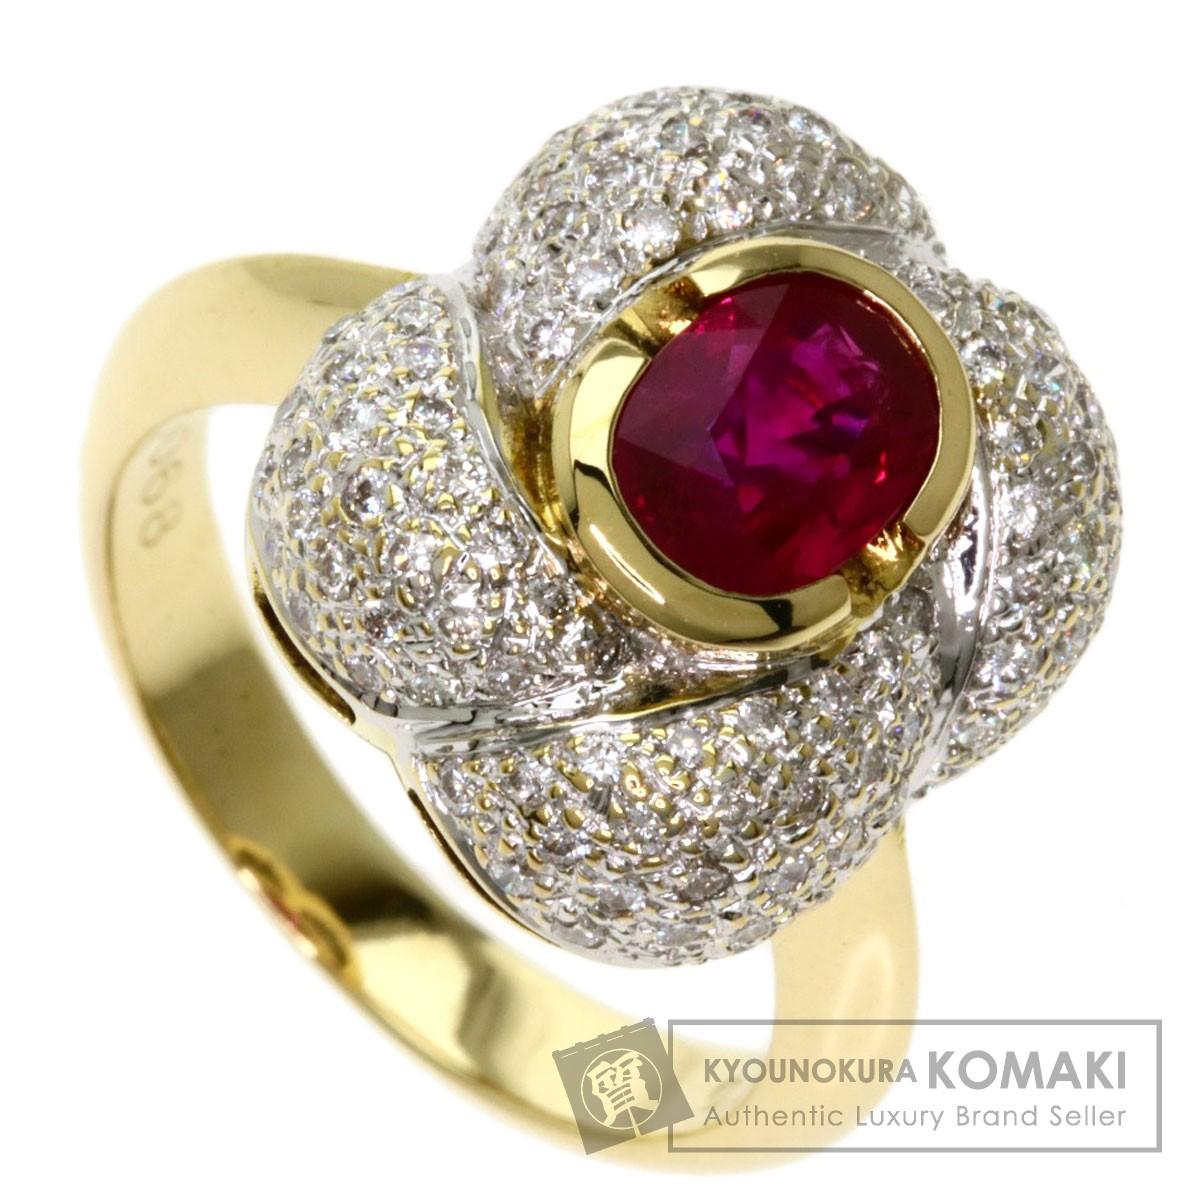 1.031ct ルビー ダイヤモンド リング・指輪 K18イエローゴールド 7.7g レディース 【中古】